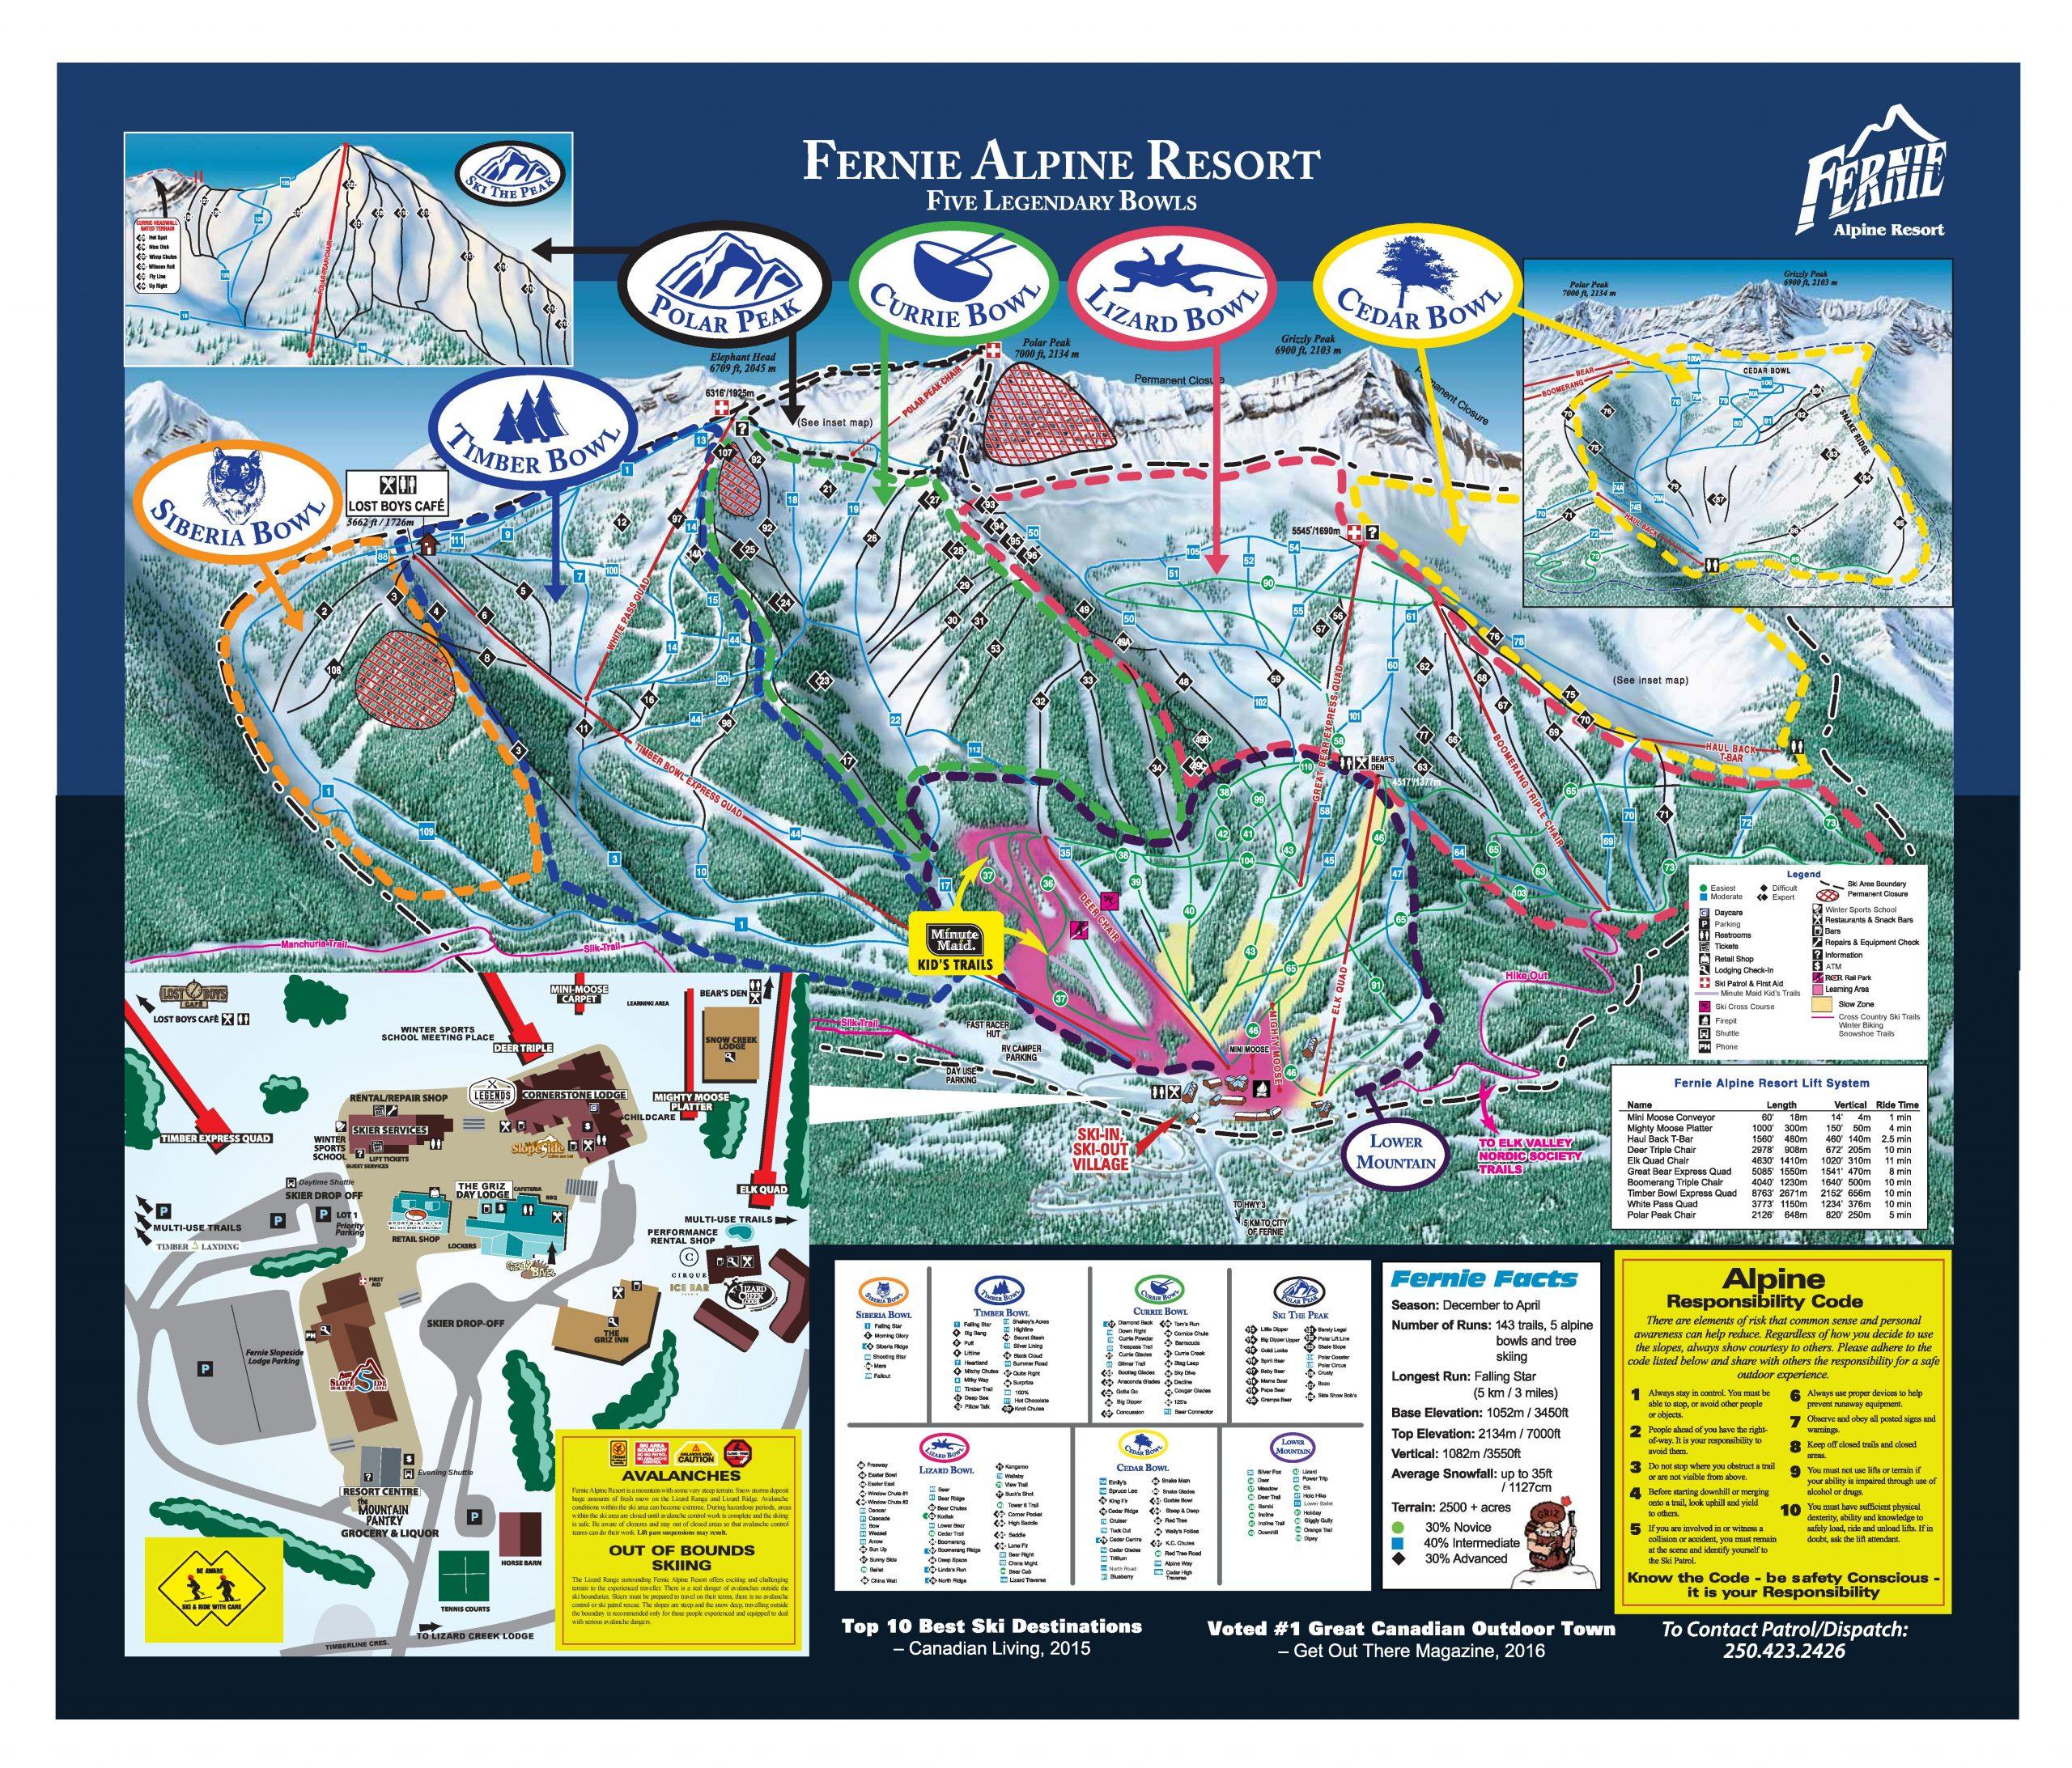 Fernie Alpine Resort trail map